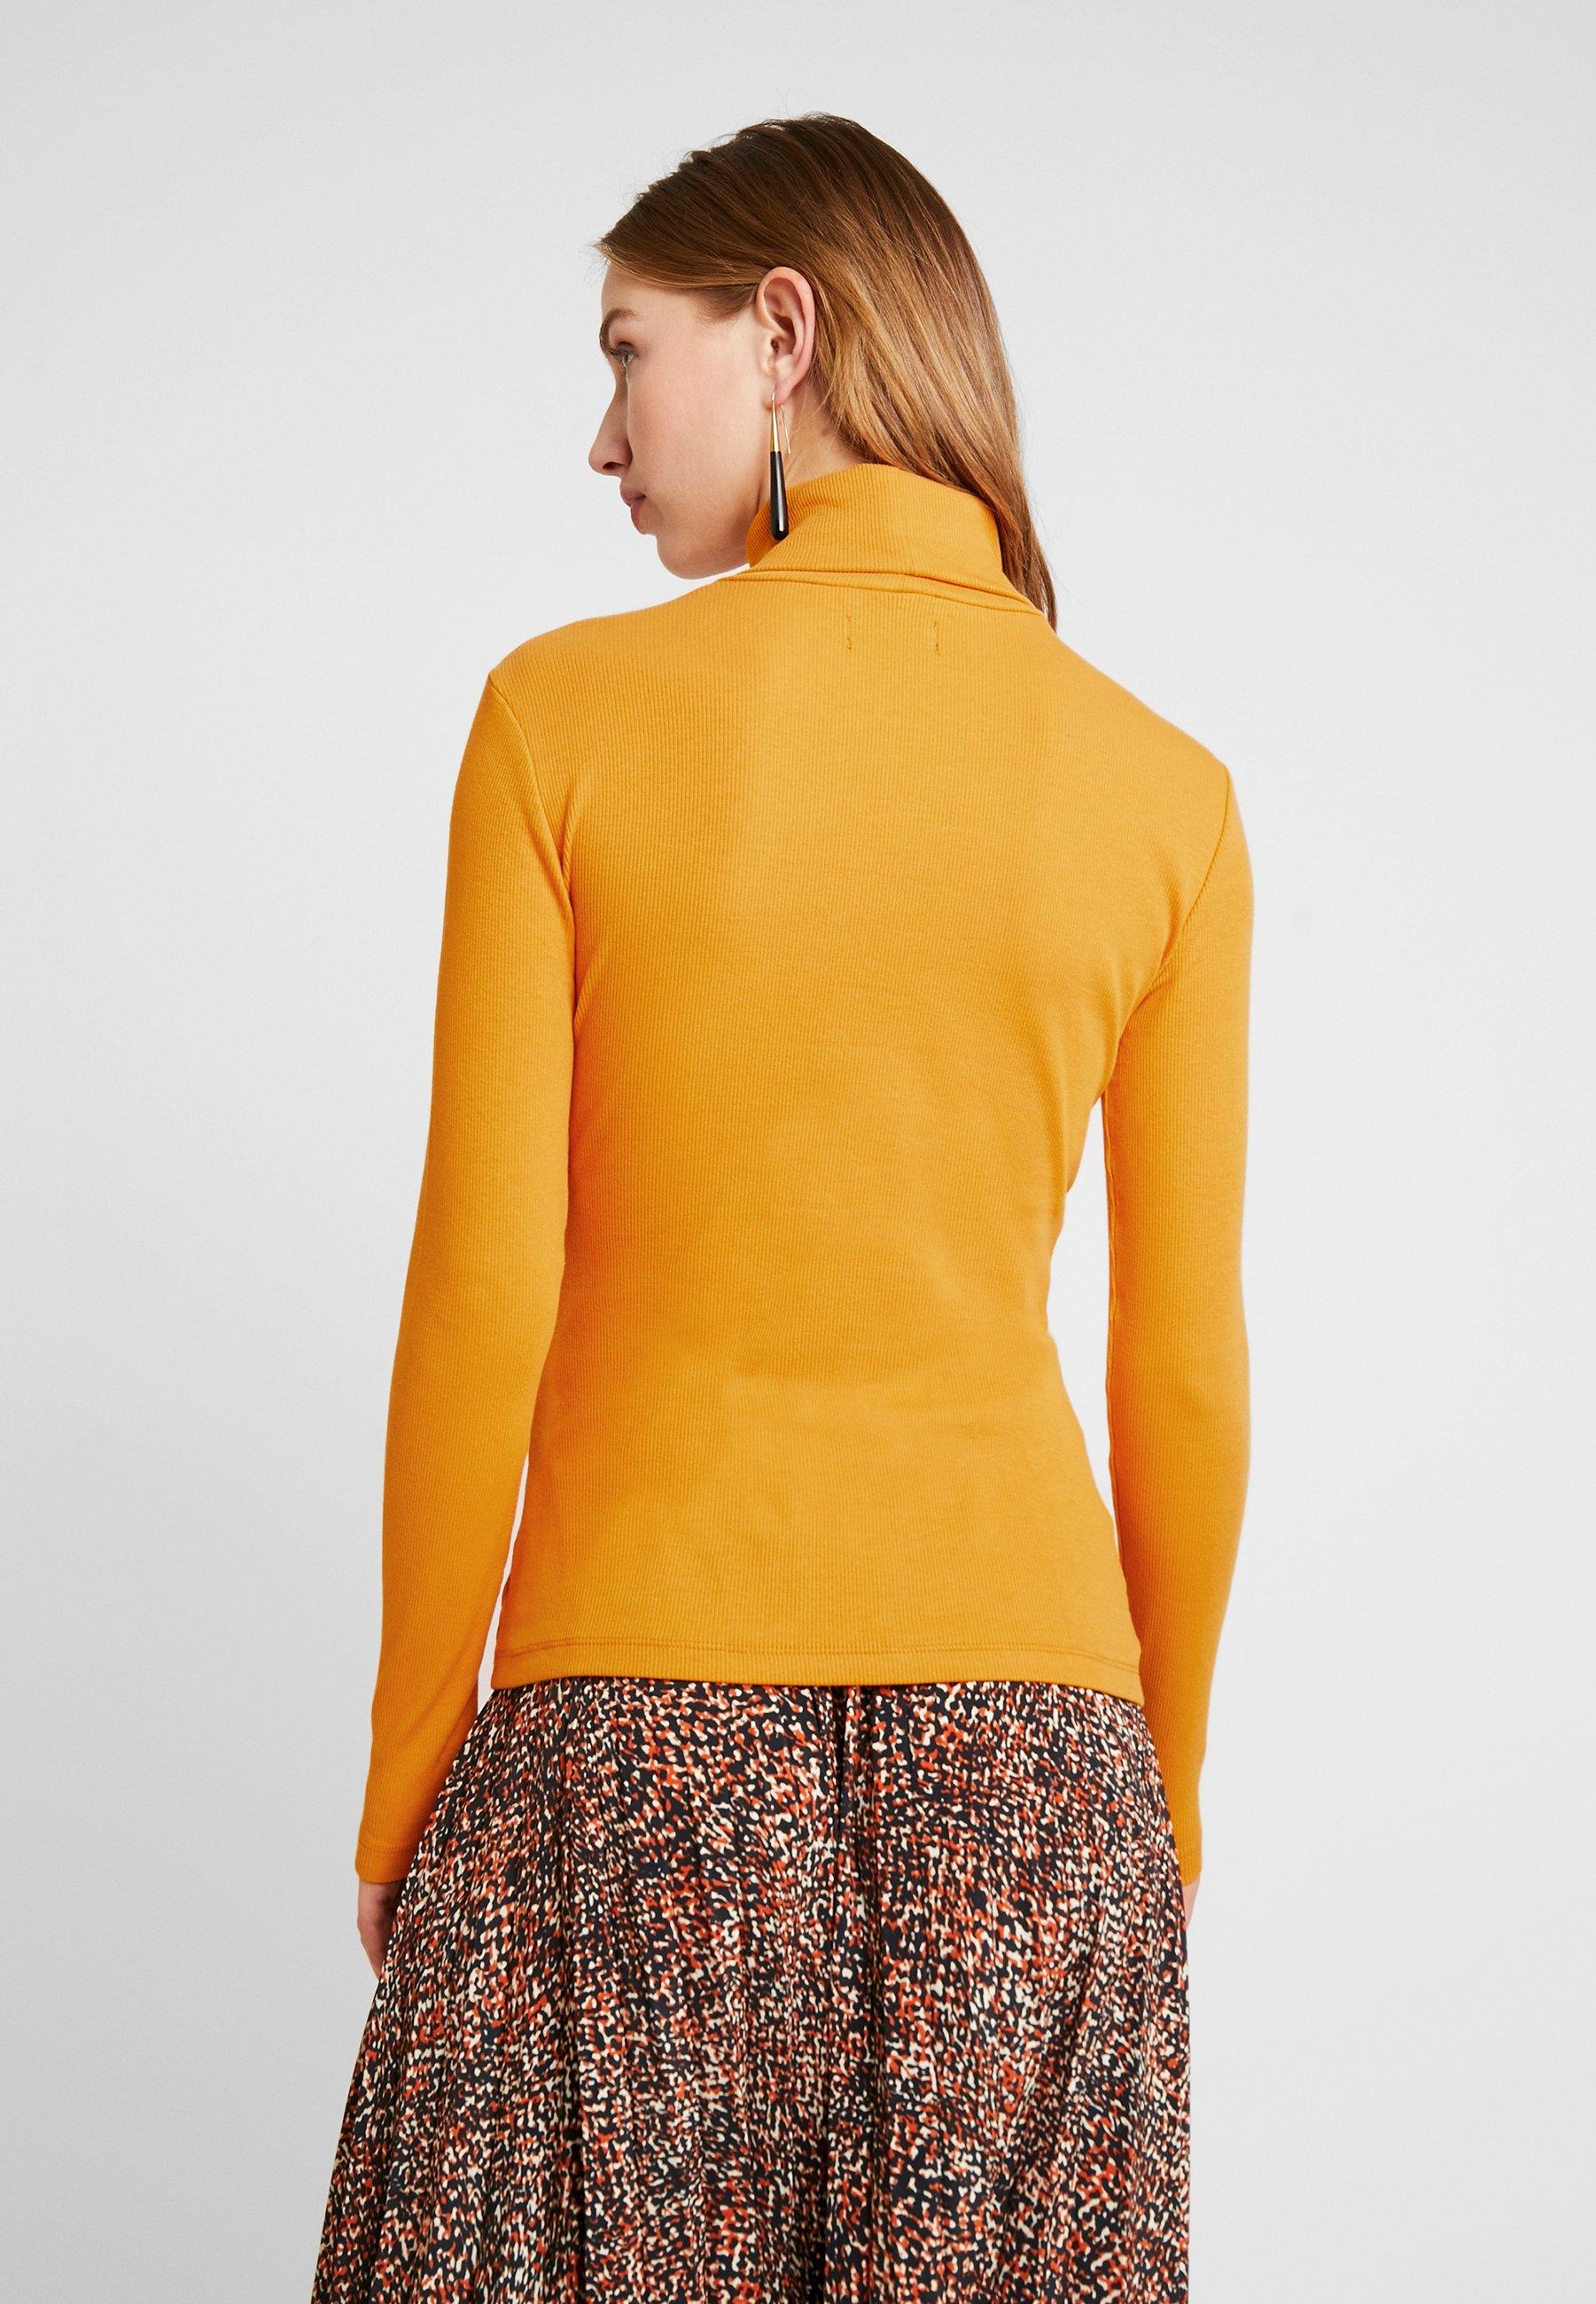 BASICT yellow shirt dark longues manches à Even amp;Odd rWQCeodxB